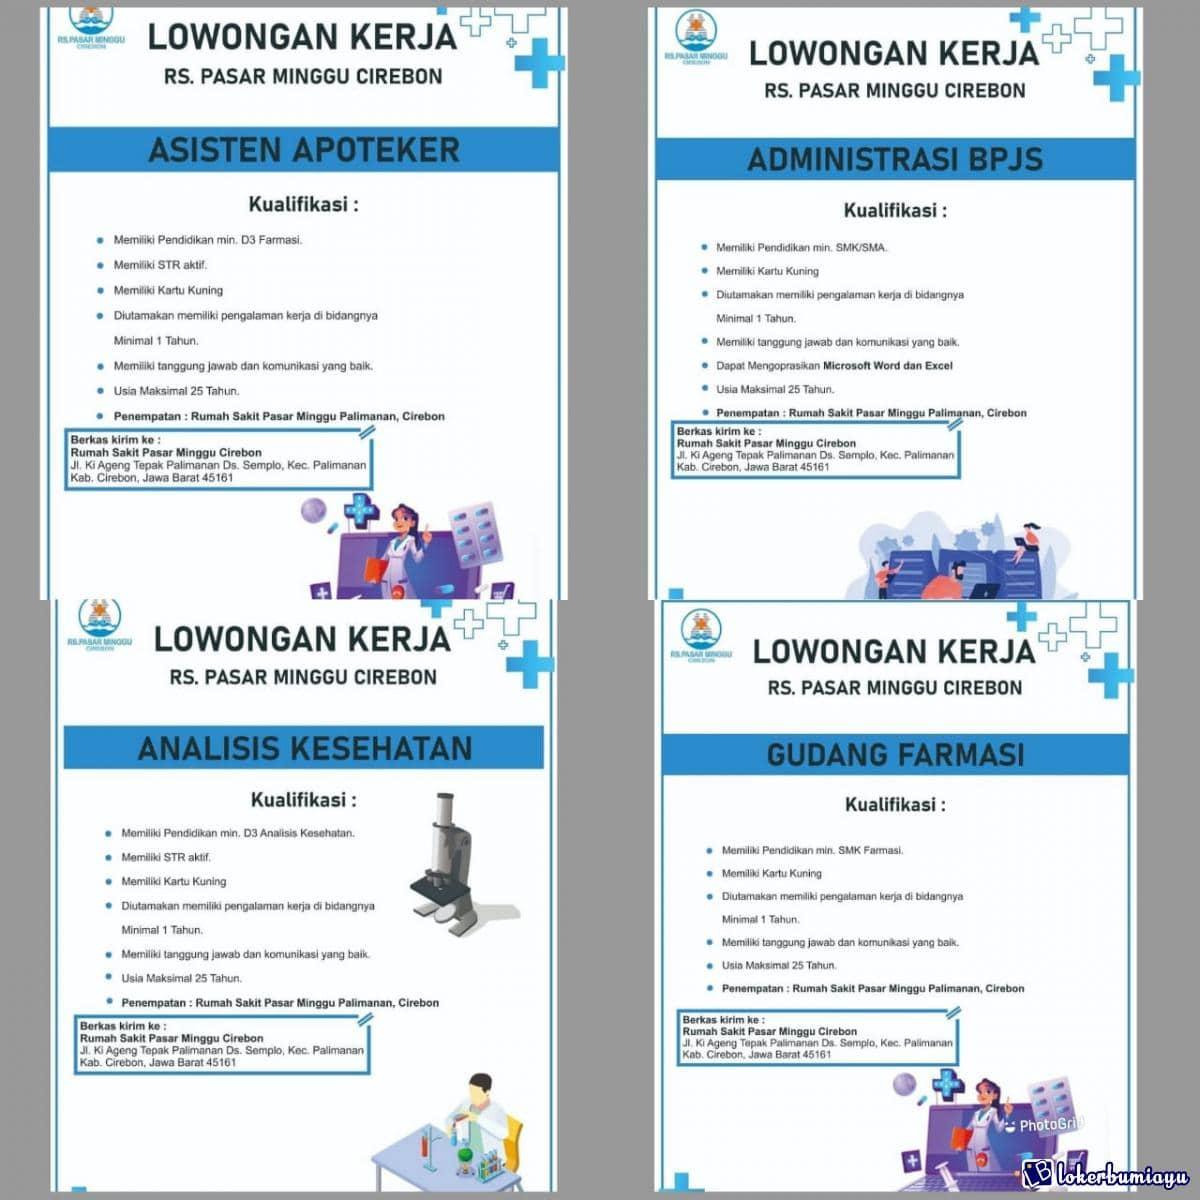 Lowongan Kerja Rumah Sakit Pasar Minggu Cirebon April 2021